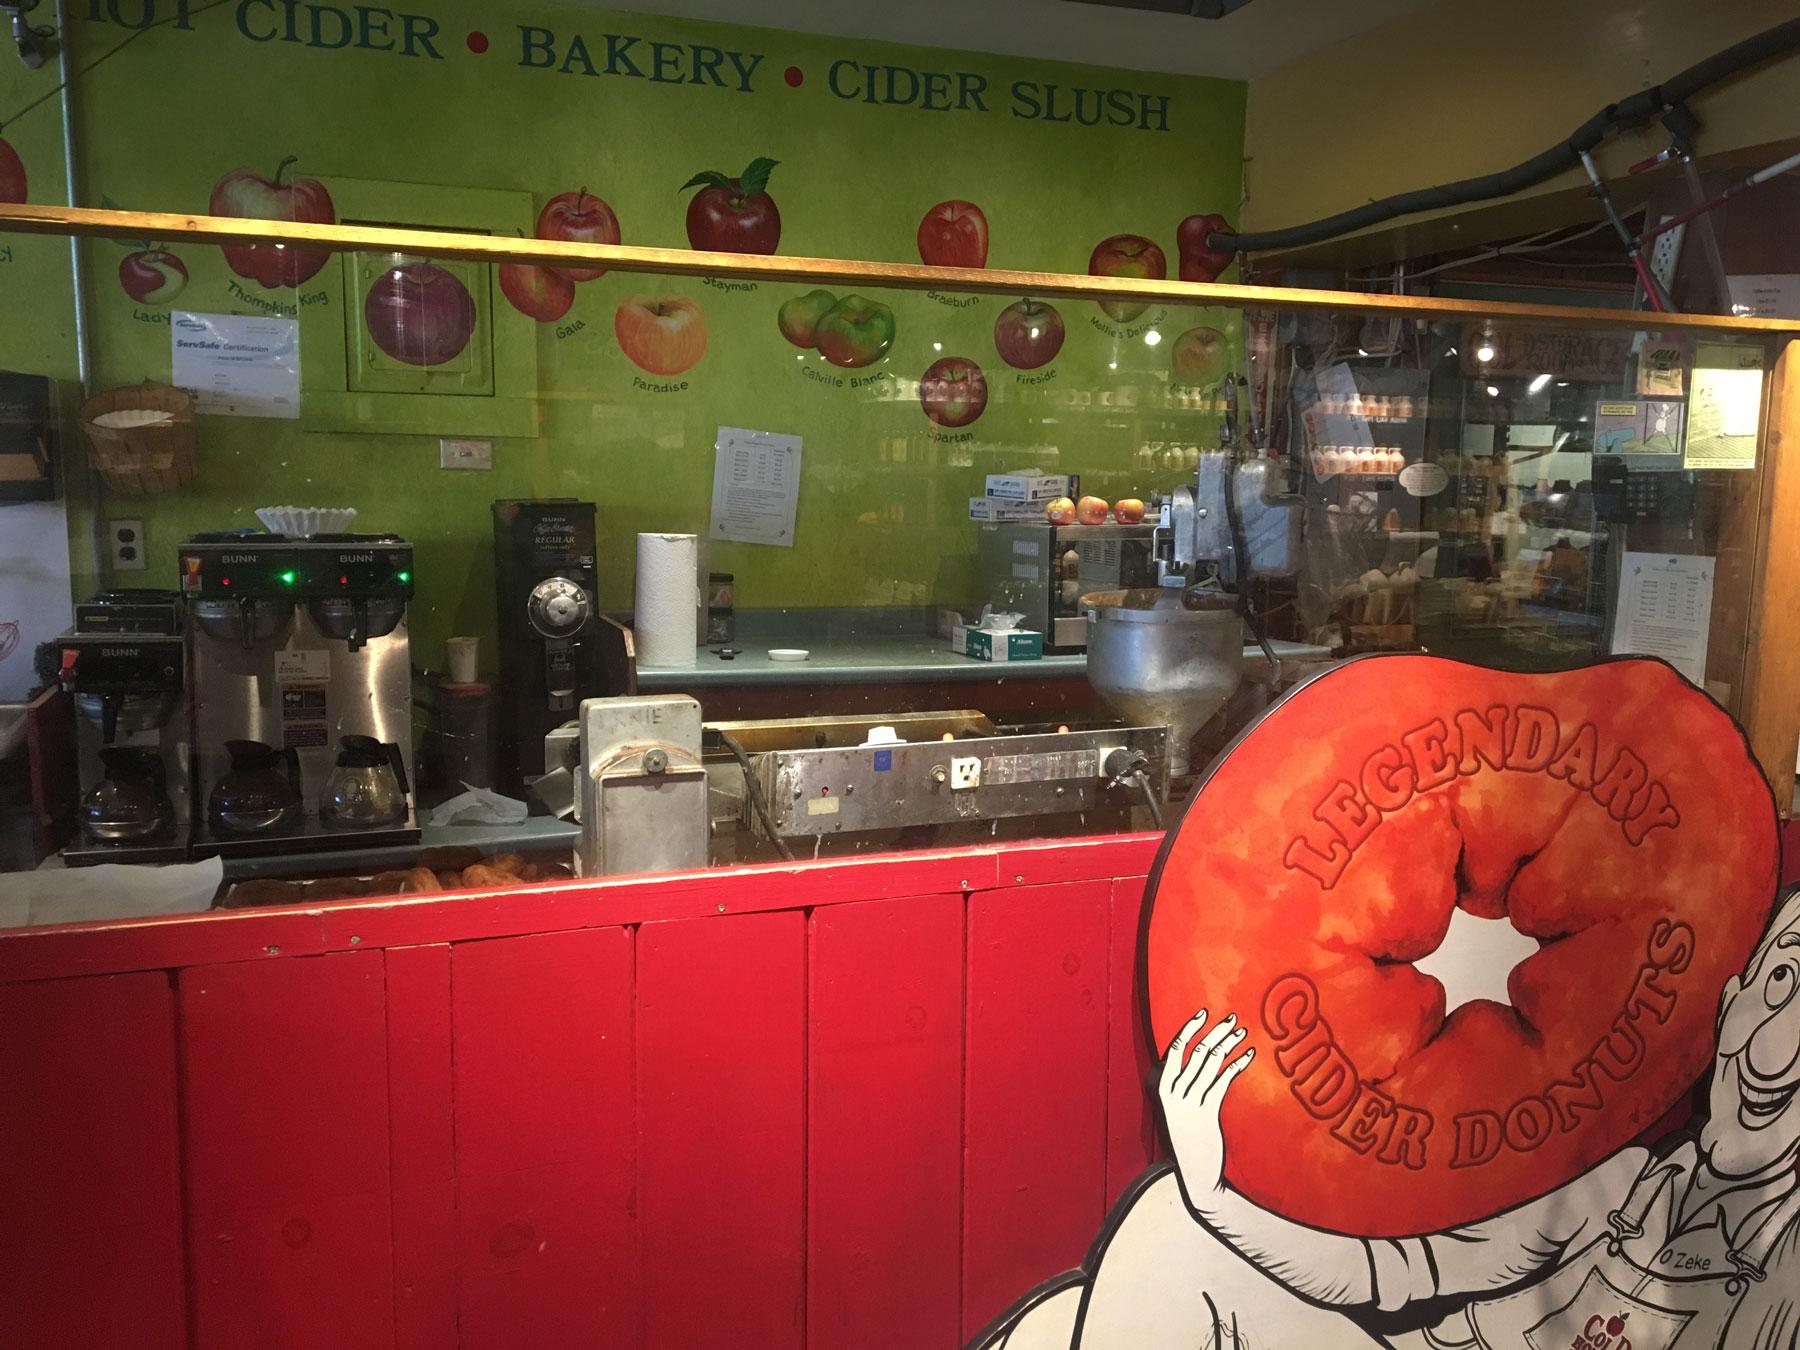 Interior of Cider Hollow Cider Mill with legendary cider donut signage